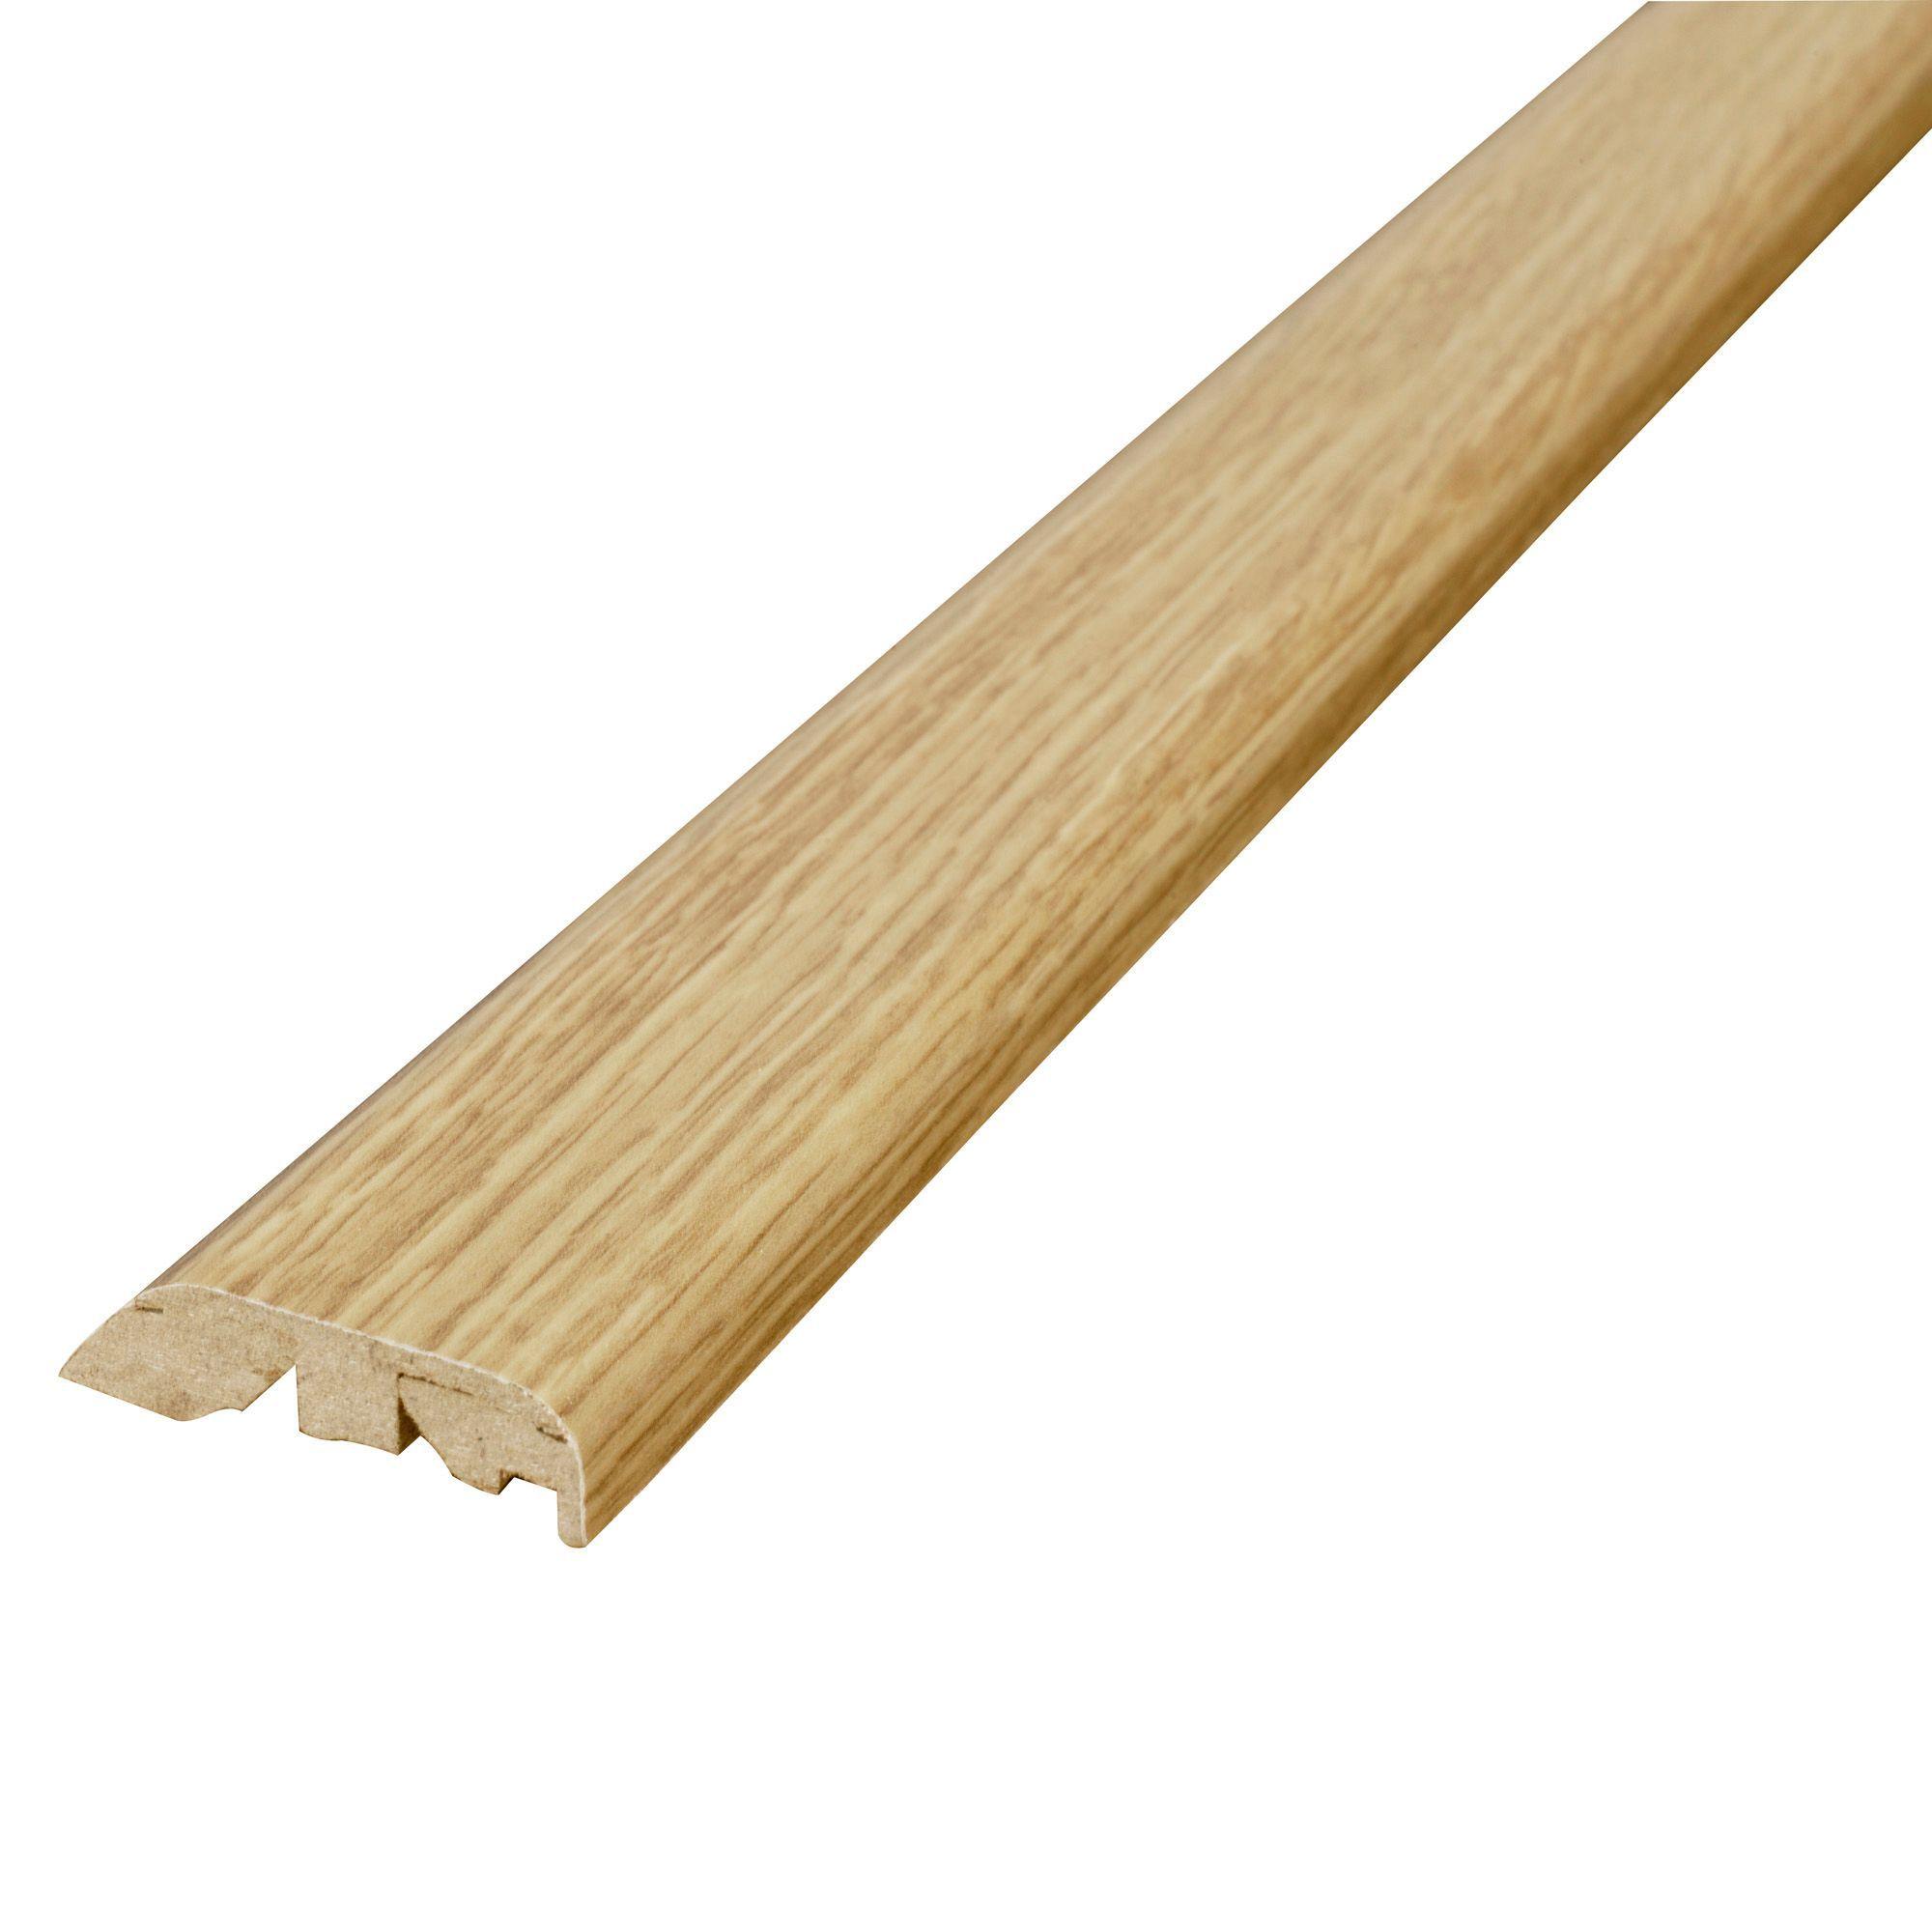 Bq Kitchen Laminate Flooring Thresholds T Bars Reducers Flooring Supplies